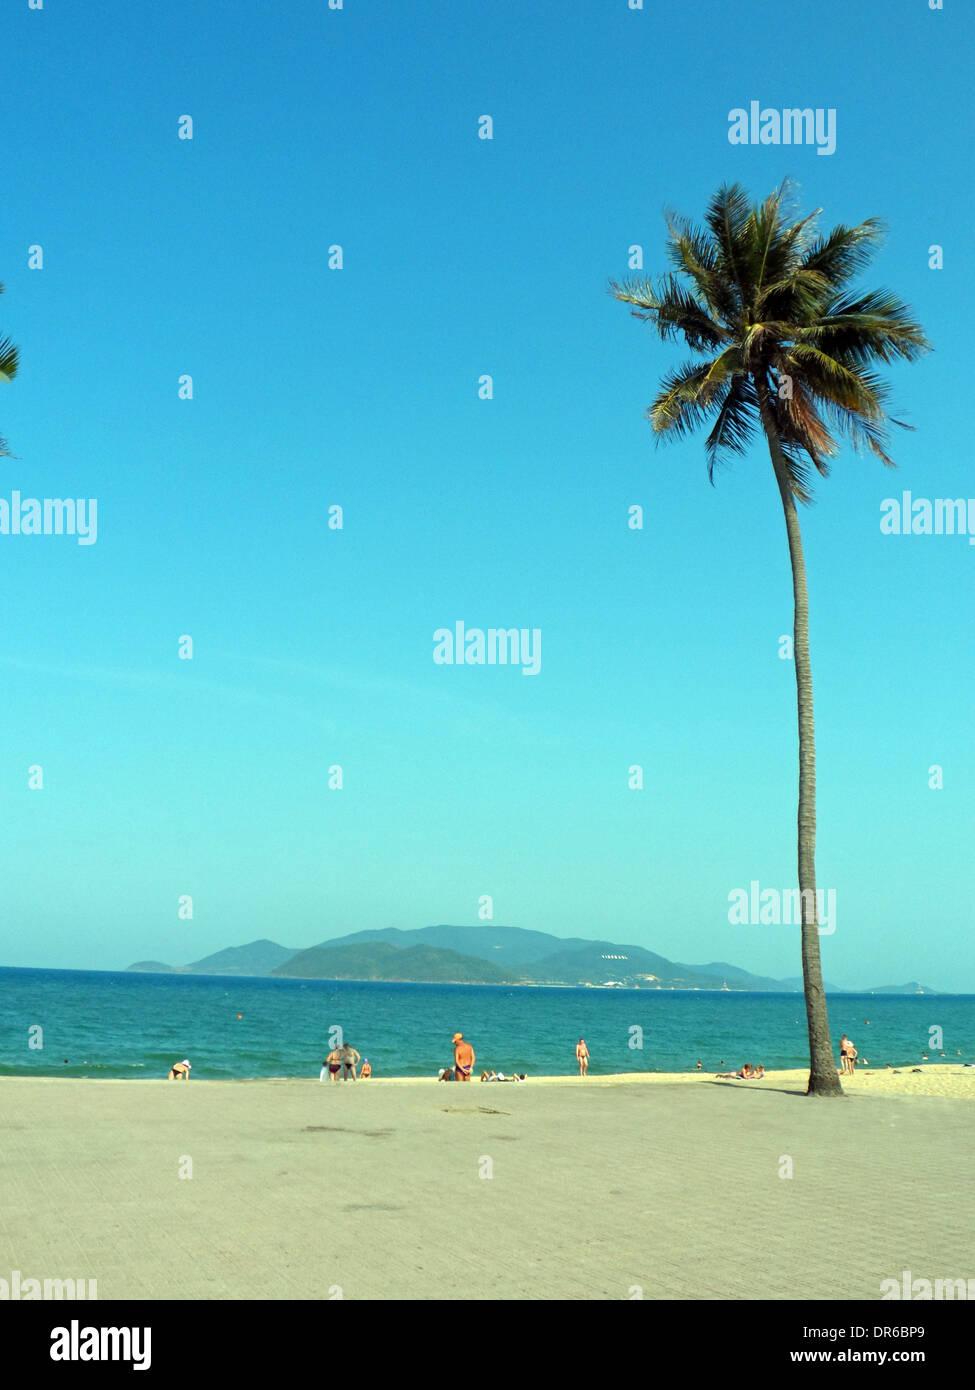 Vietnam beach looking at Vinpearl island - Stock Image